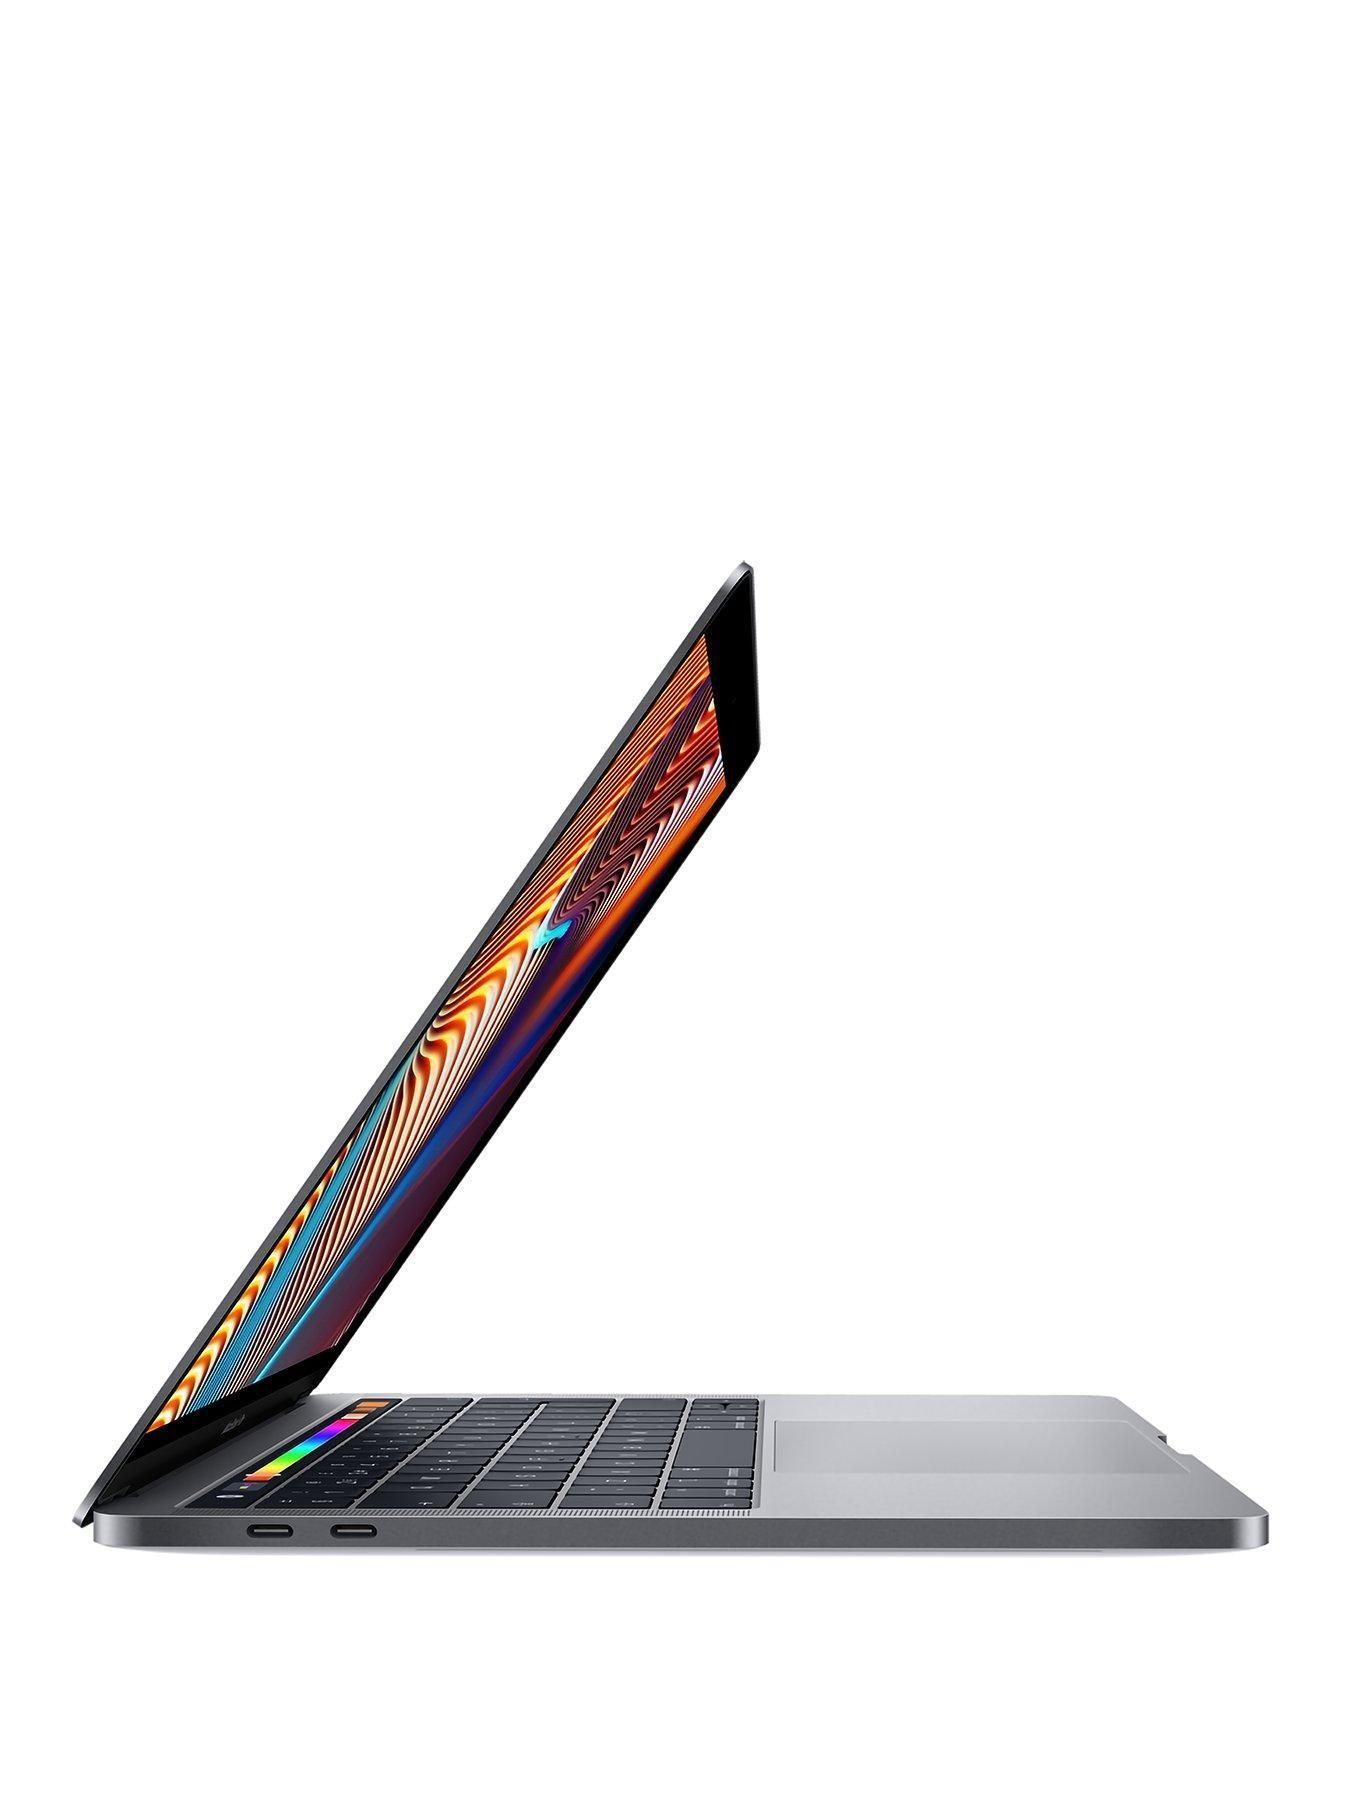 Apple Macbook Pro 2019 13 Zoll Mit Touch Bar 2 4 Ghz Quad Core Intel Core I5 Prozessor Der 8 In 2020 Apple Macbook Pro Macbook Macbook Pro